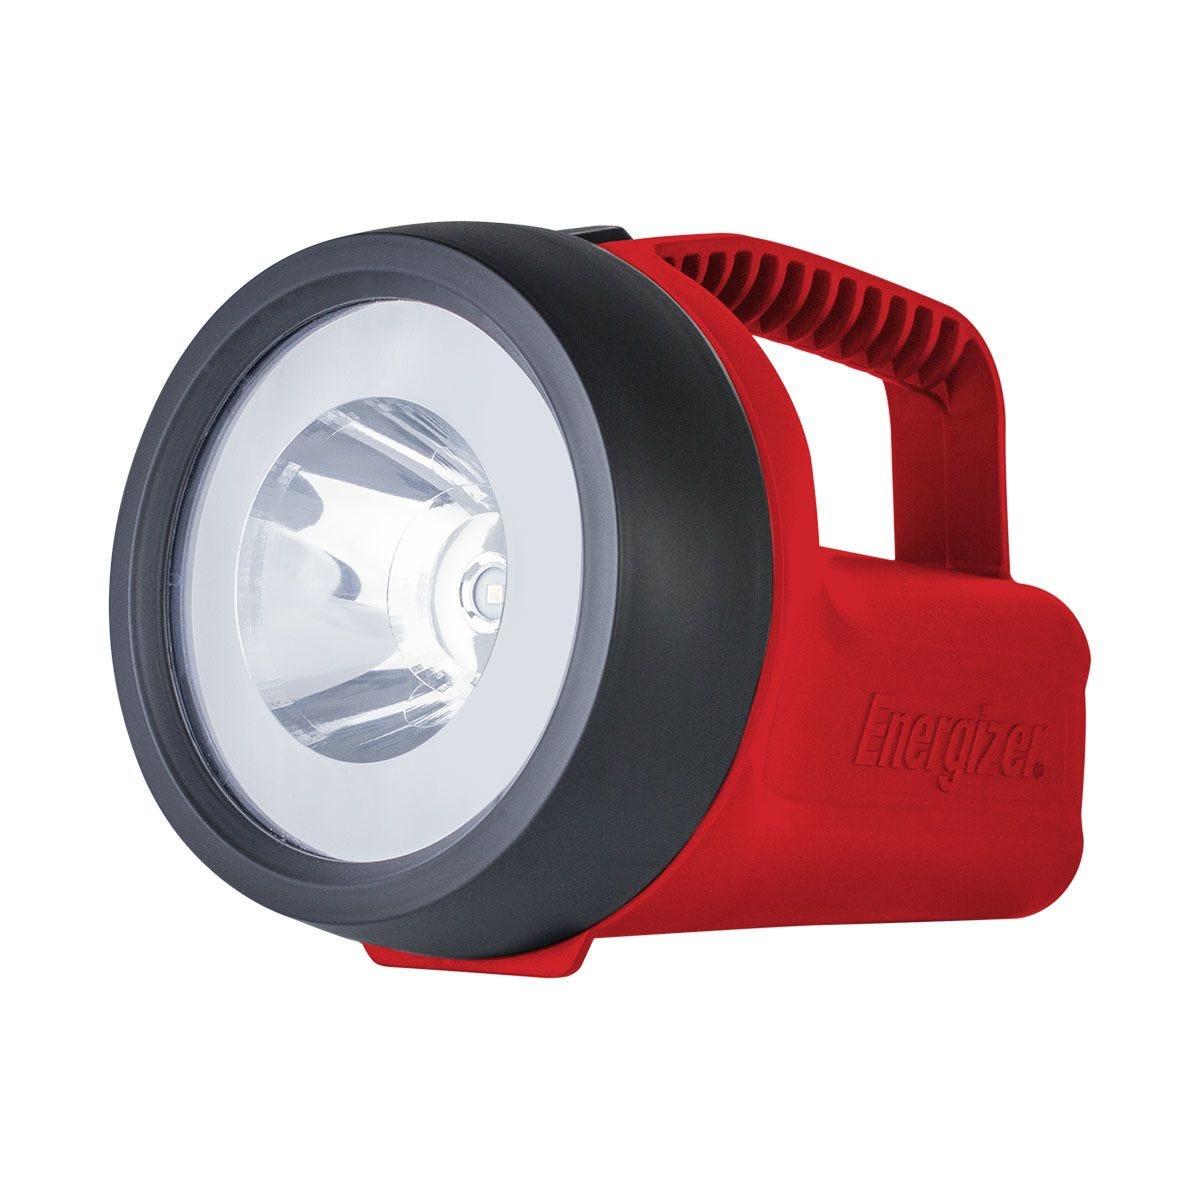 Energizer 4D LED Lantern